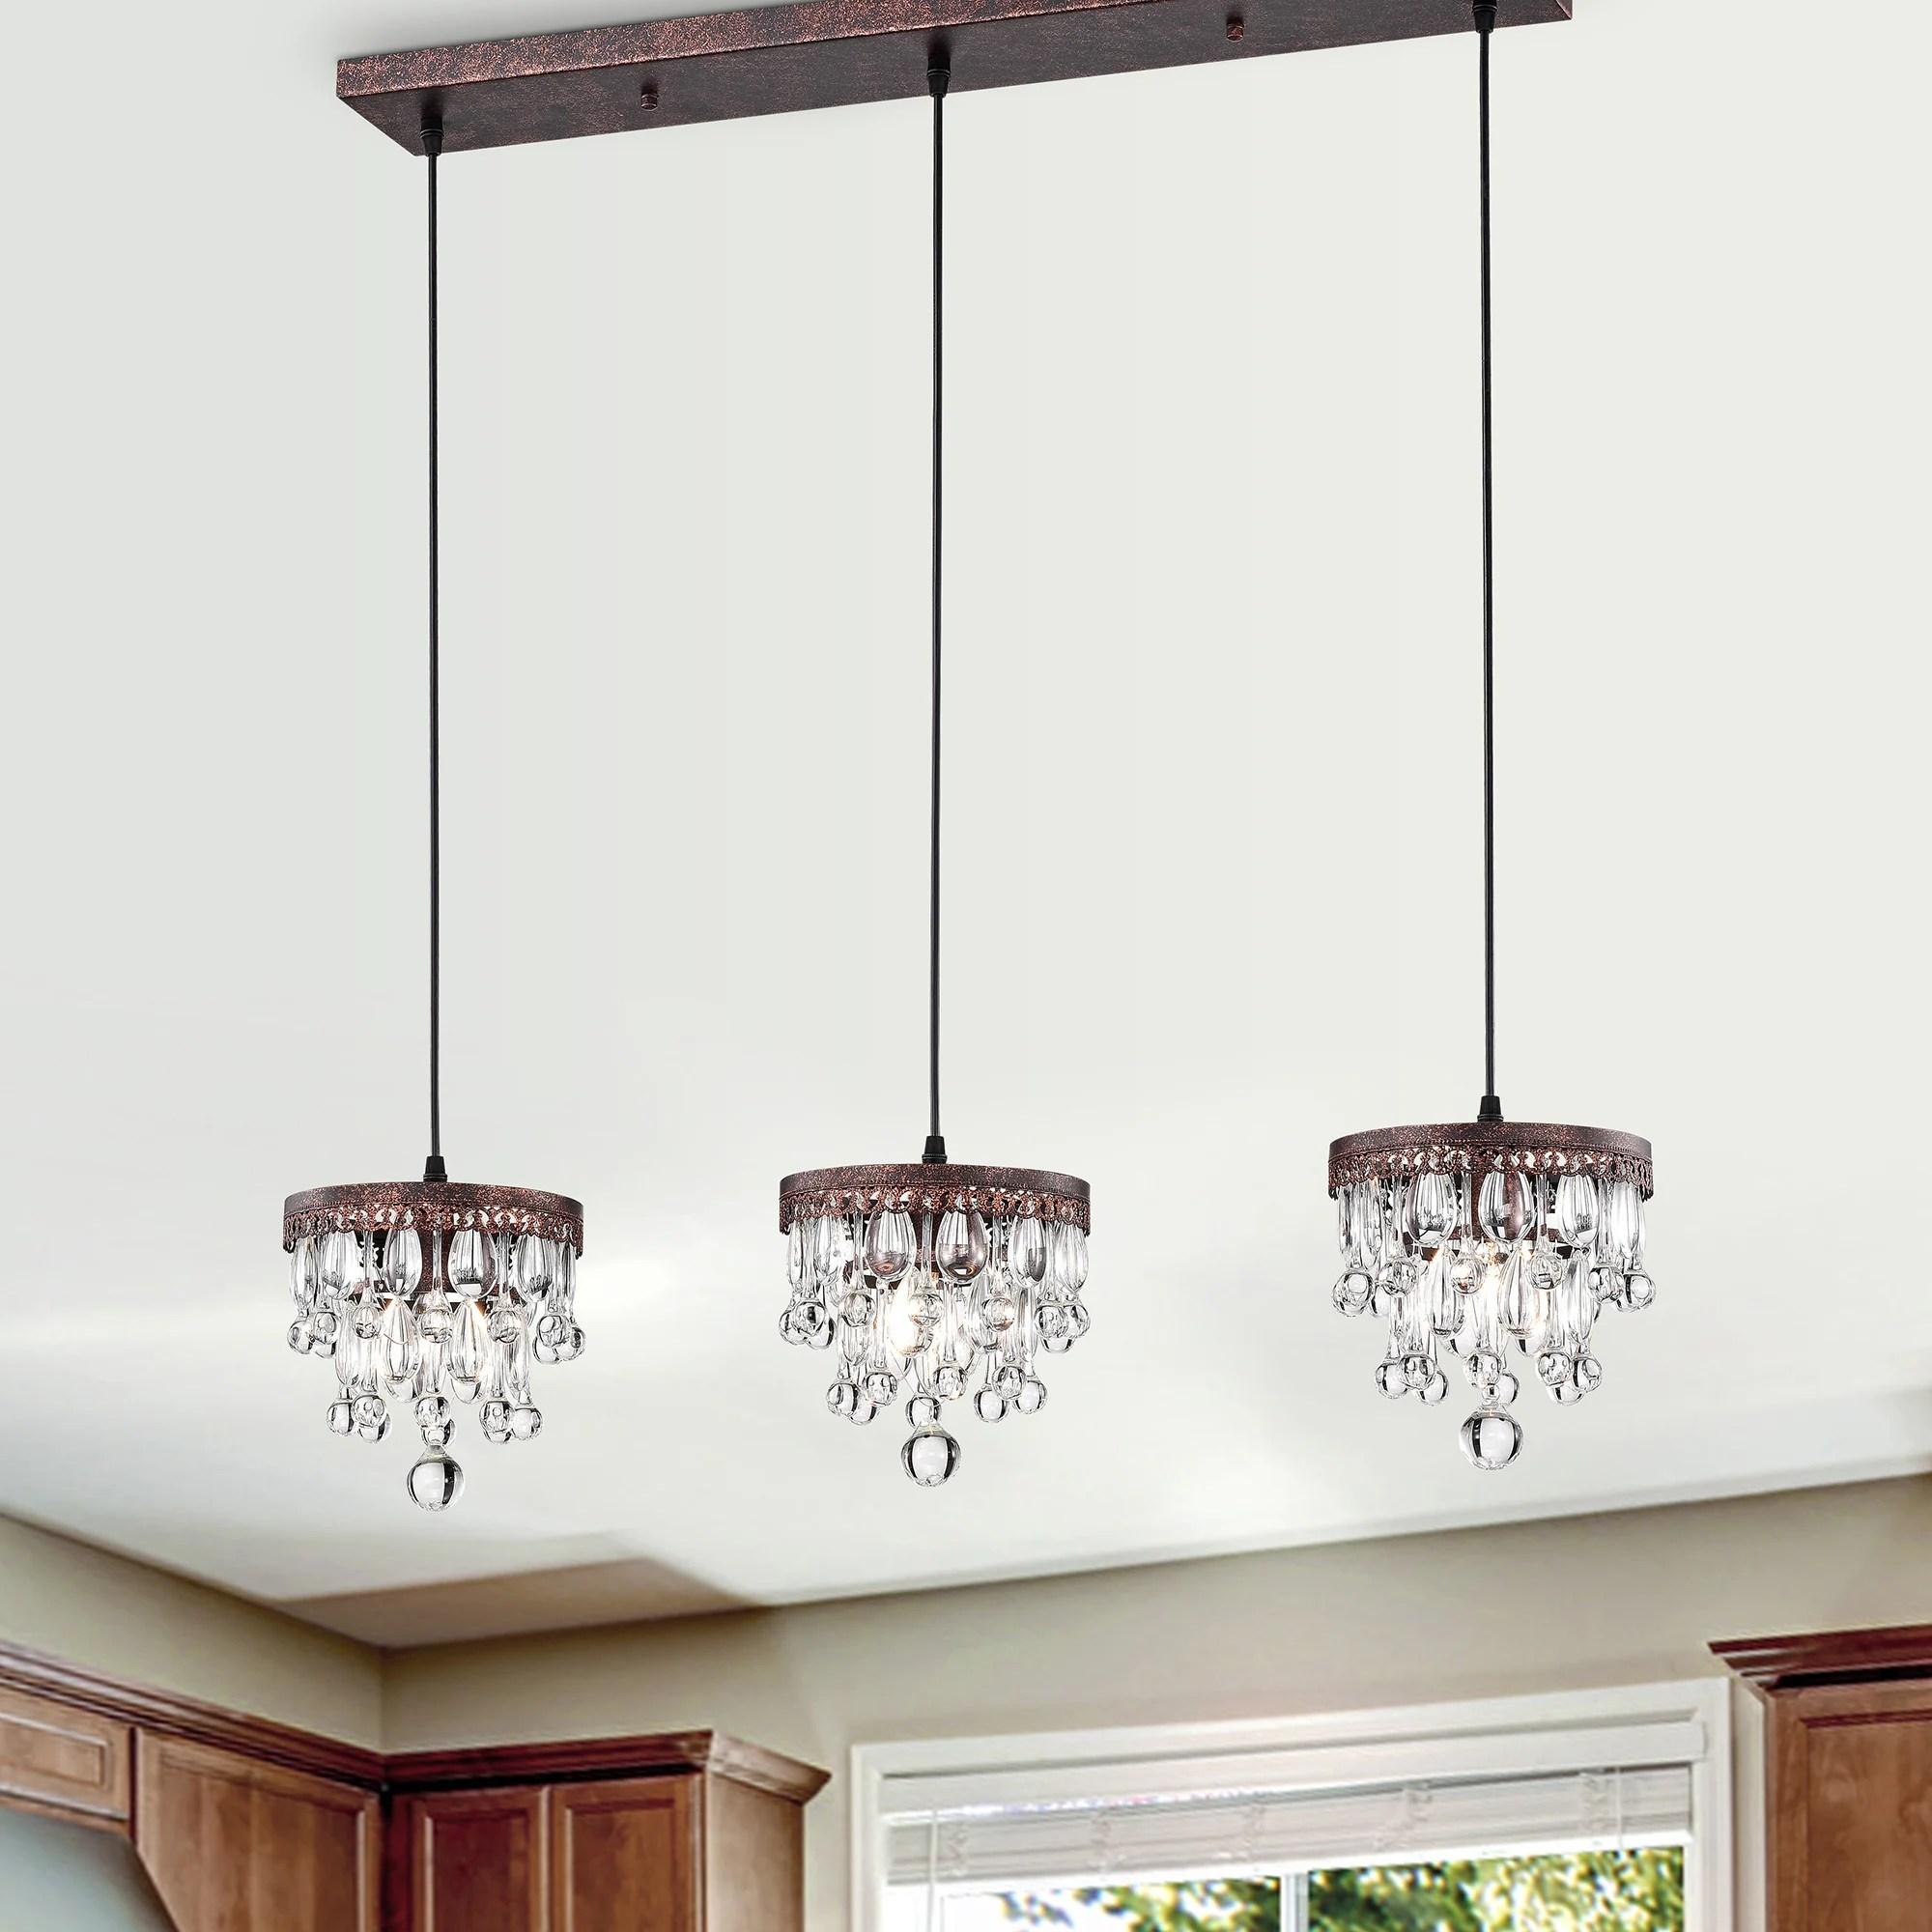 jerri antique copper 3 light 5 tier hanging crystals kitchen island pendant light